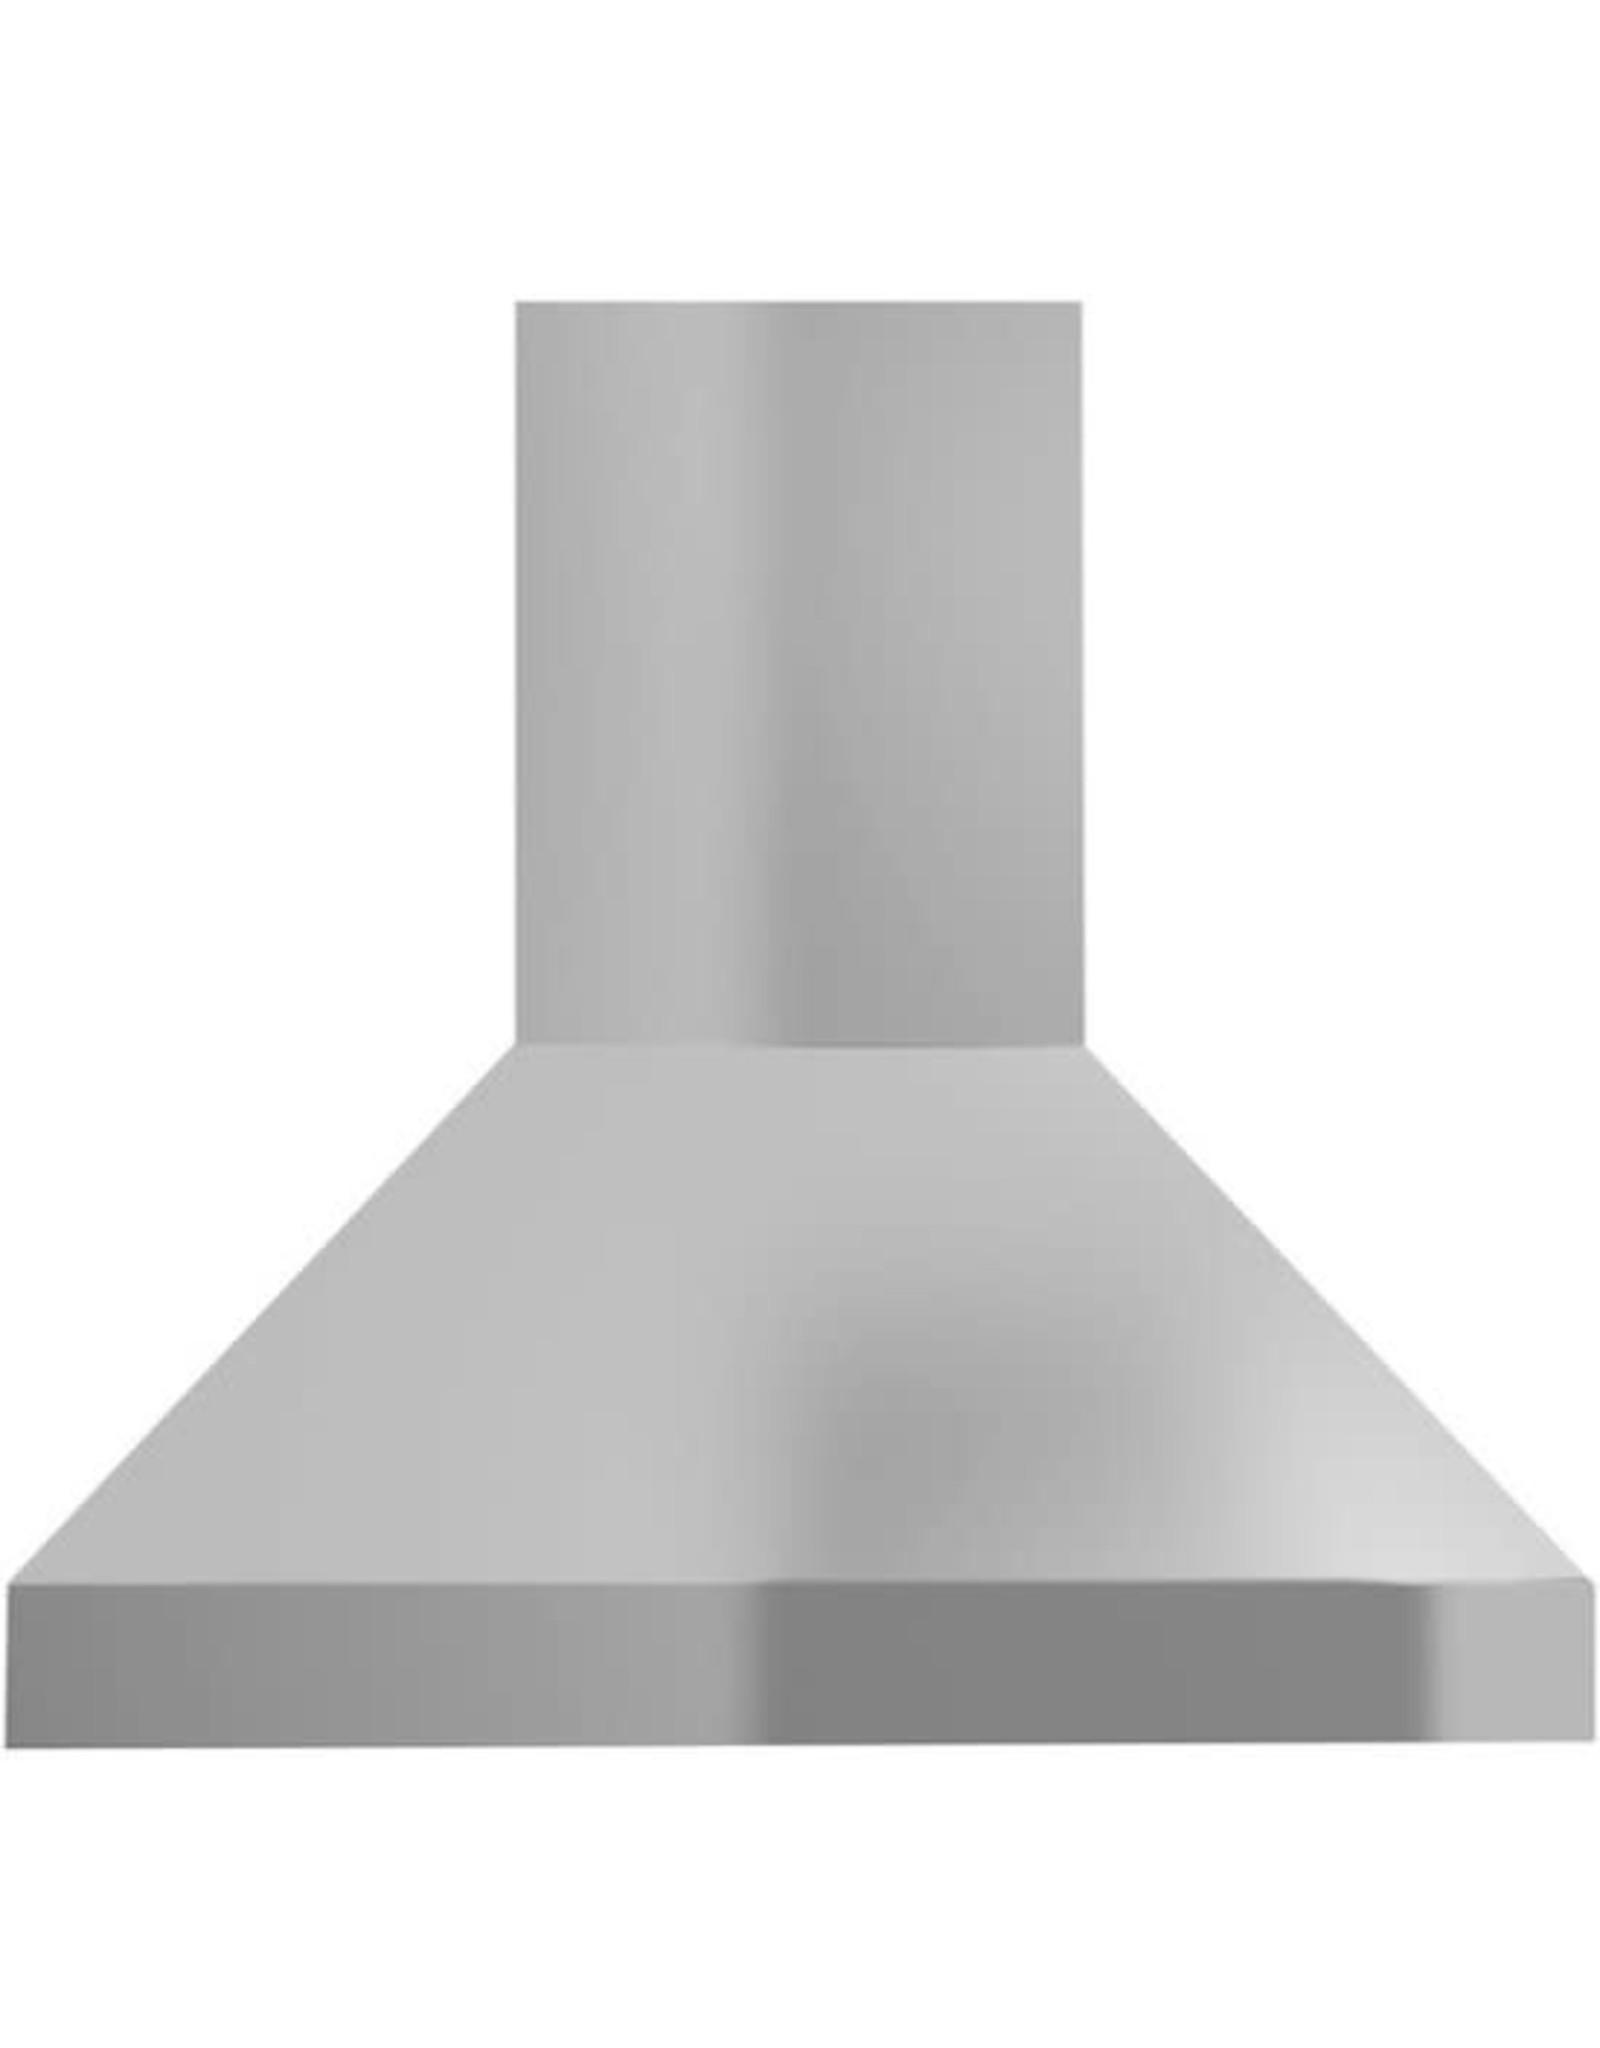 "ZLINE AR59730E32 ZLINE - Professional 30"" Externally Vented Range Hood - Stainless steel"